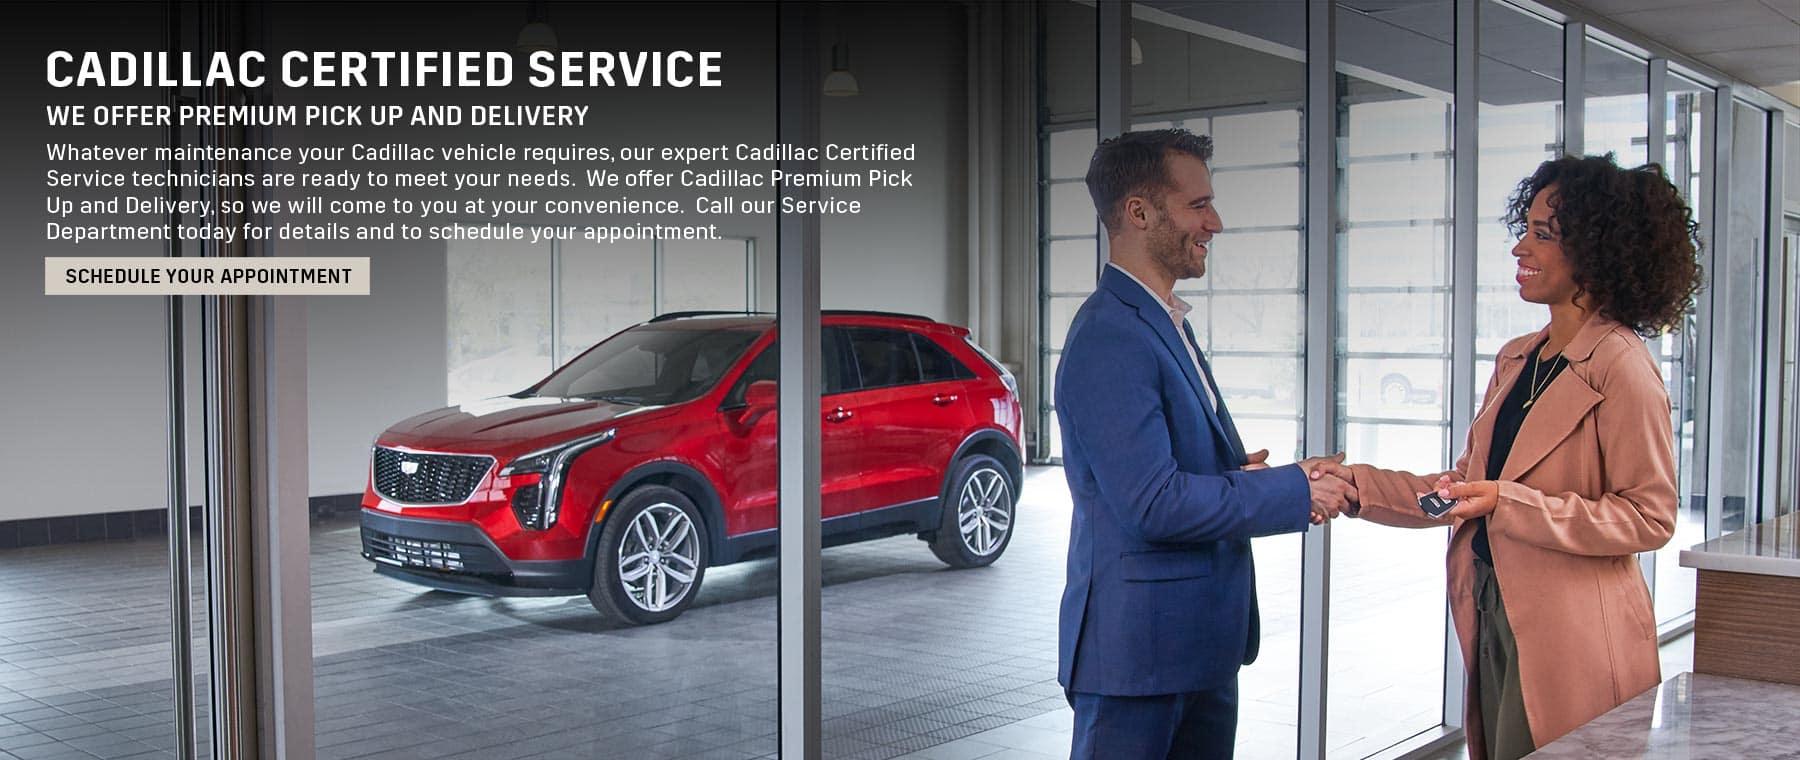 GMLC1161002-April-Cadillac-Certified-Service-Masthead-1800×760